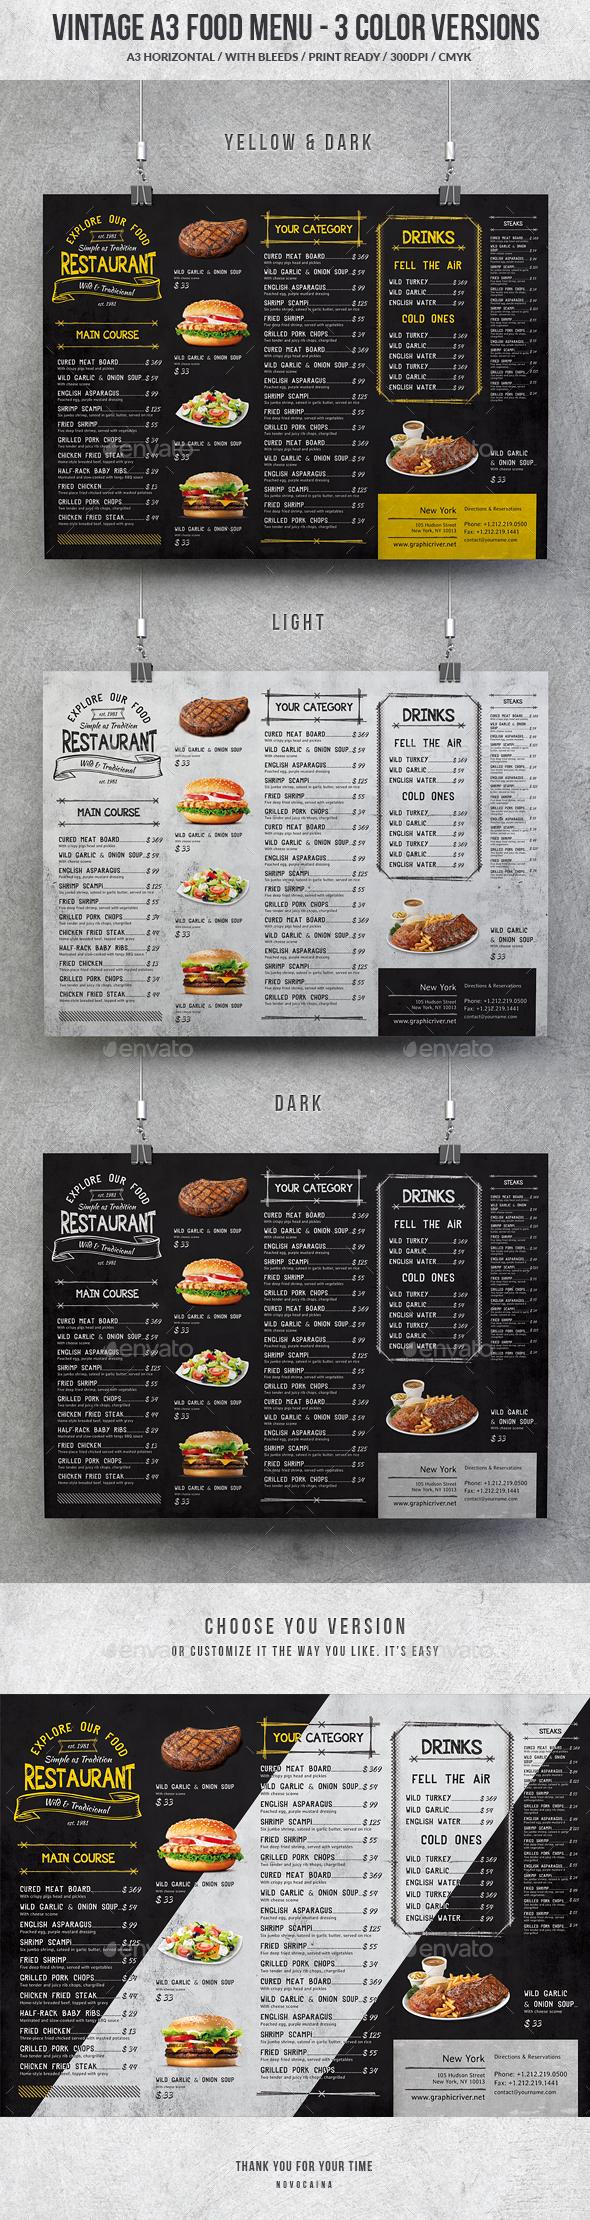 Vintage A3 Food Menu - 3 Color Versions - Food Menus Print Templates